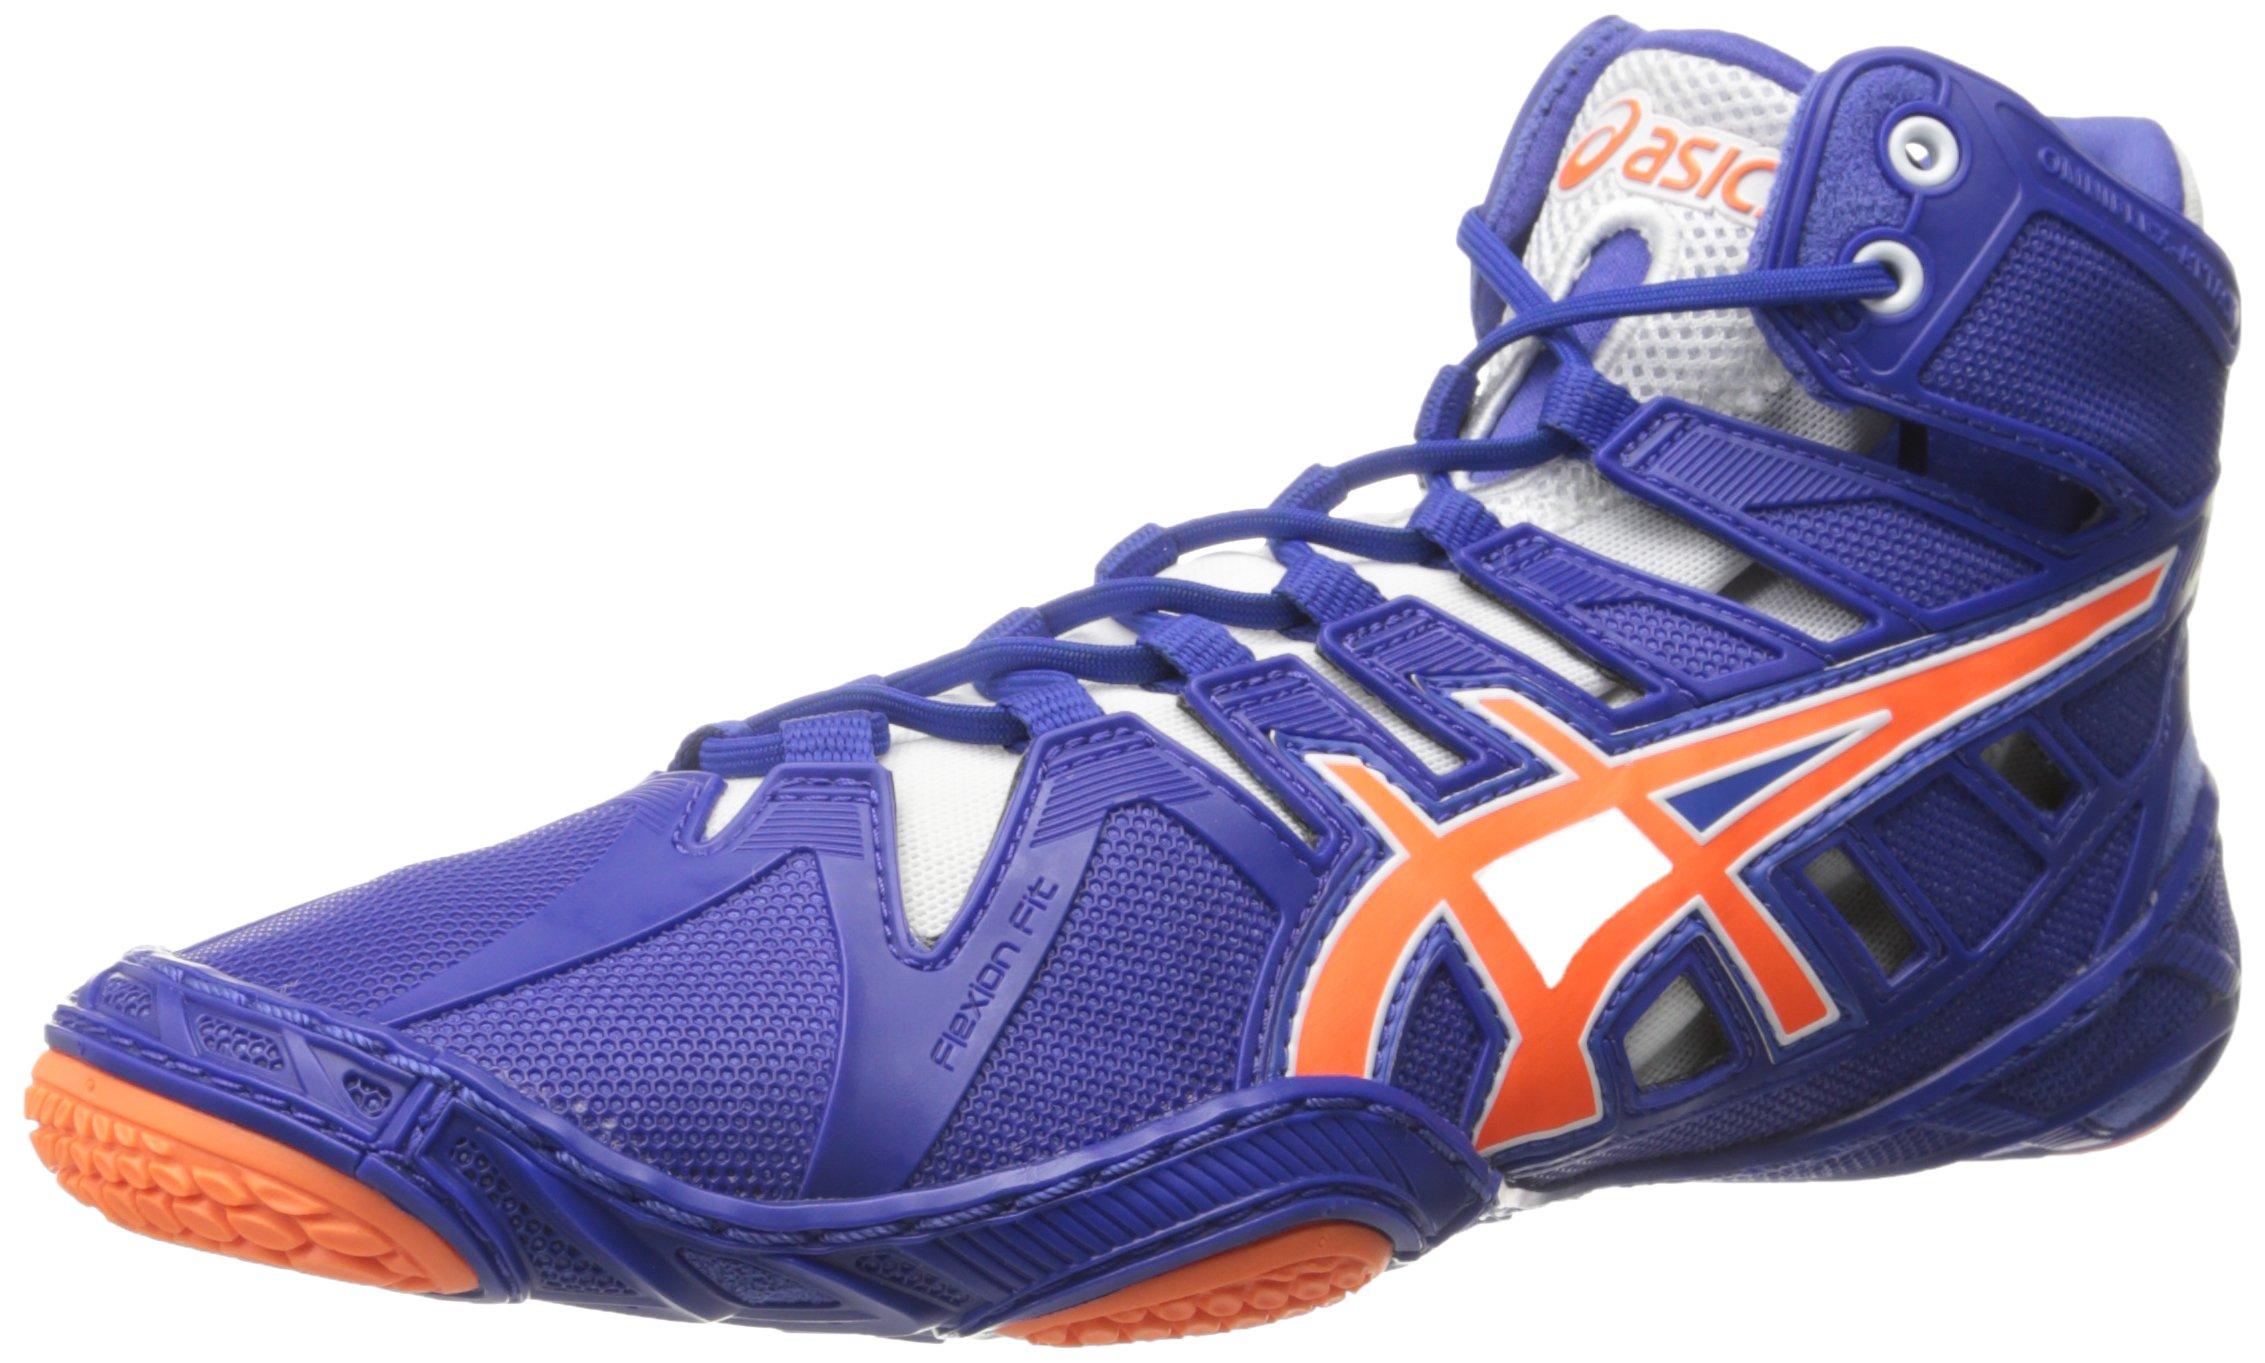 ASICS Men's Omniflex-Attack 2 Wrestling Shoe, True Blue/Shocking Orange/White, 11.5 M US